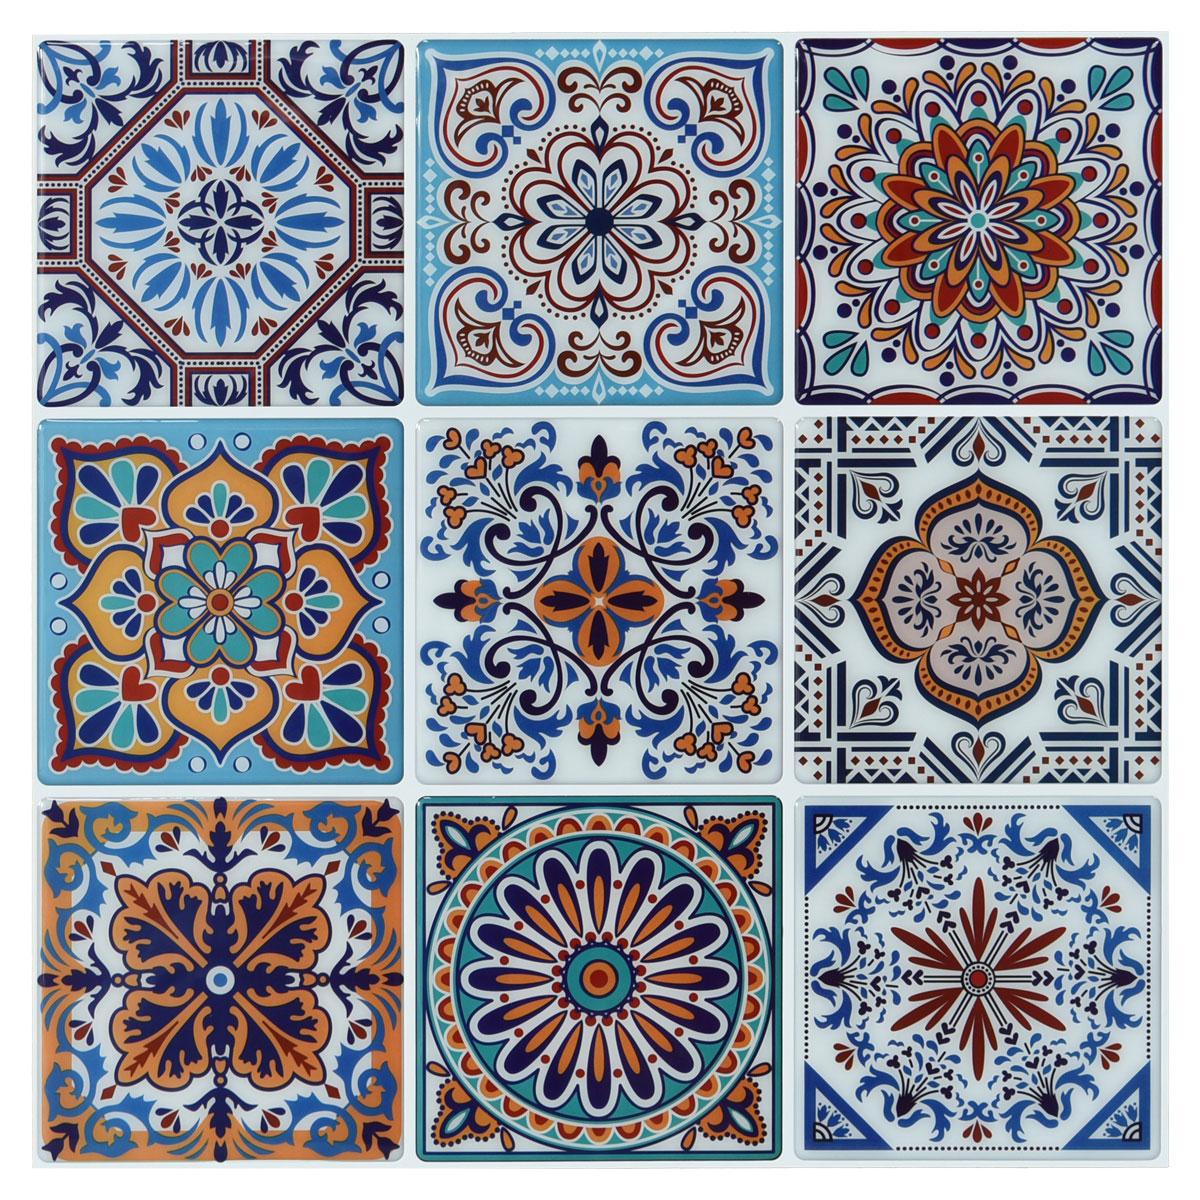 10 Sheets Peel and Stick Backsplash Tile for Kitchen Colorful Talavera Mexican Tile